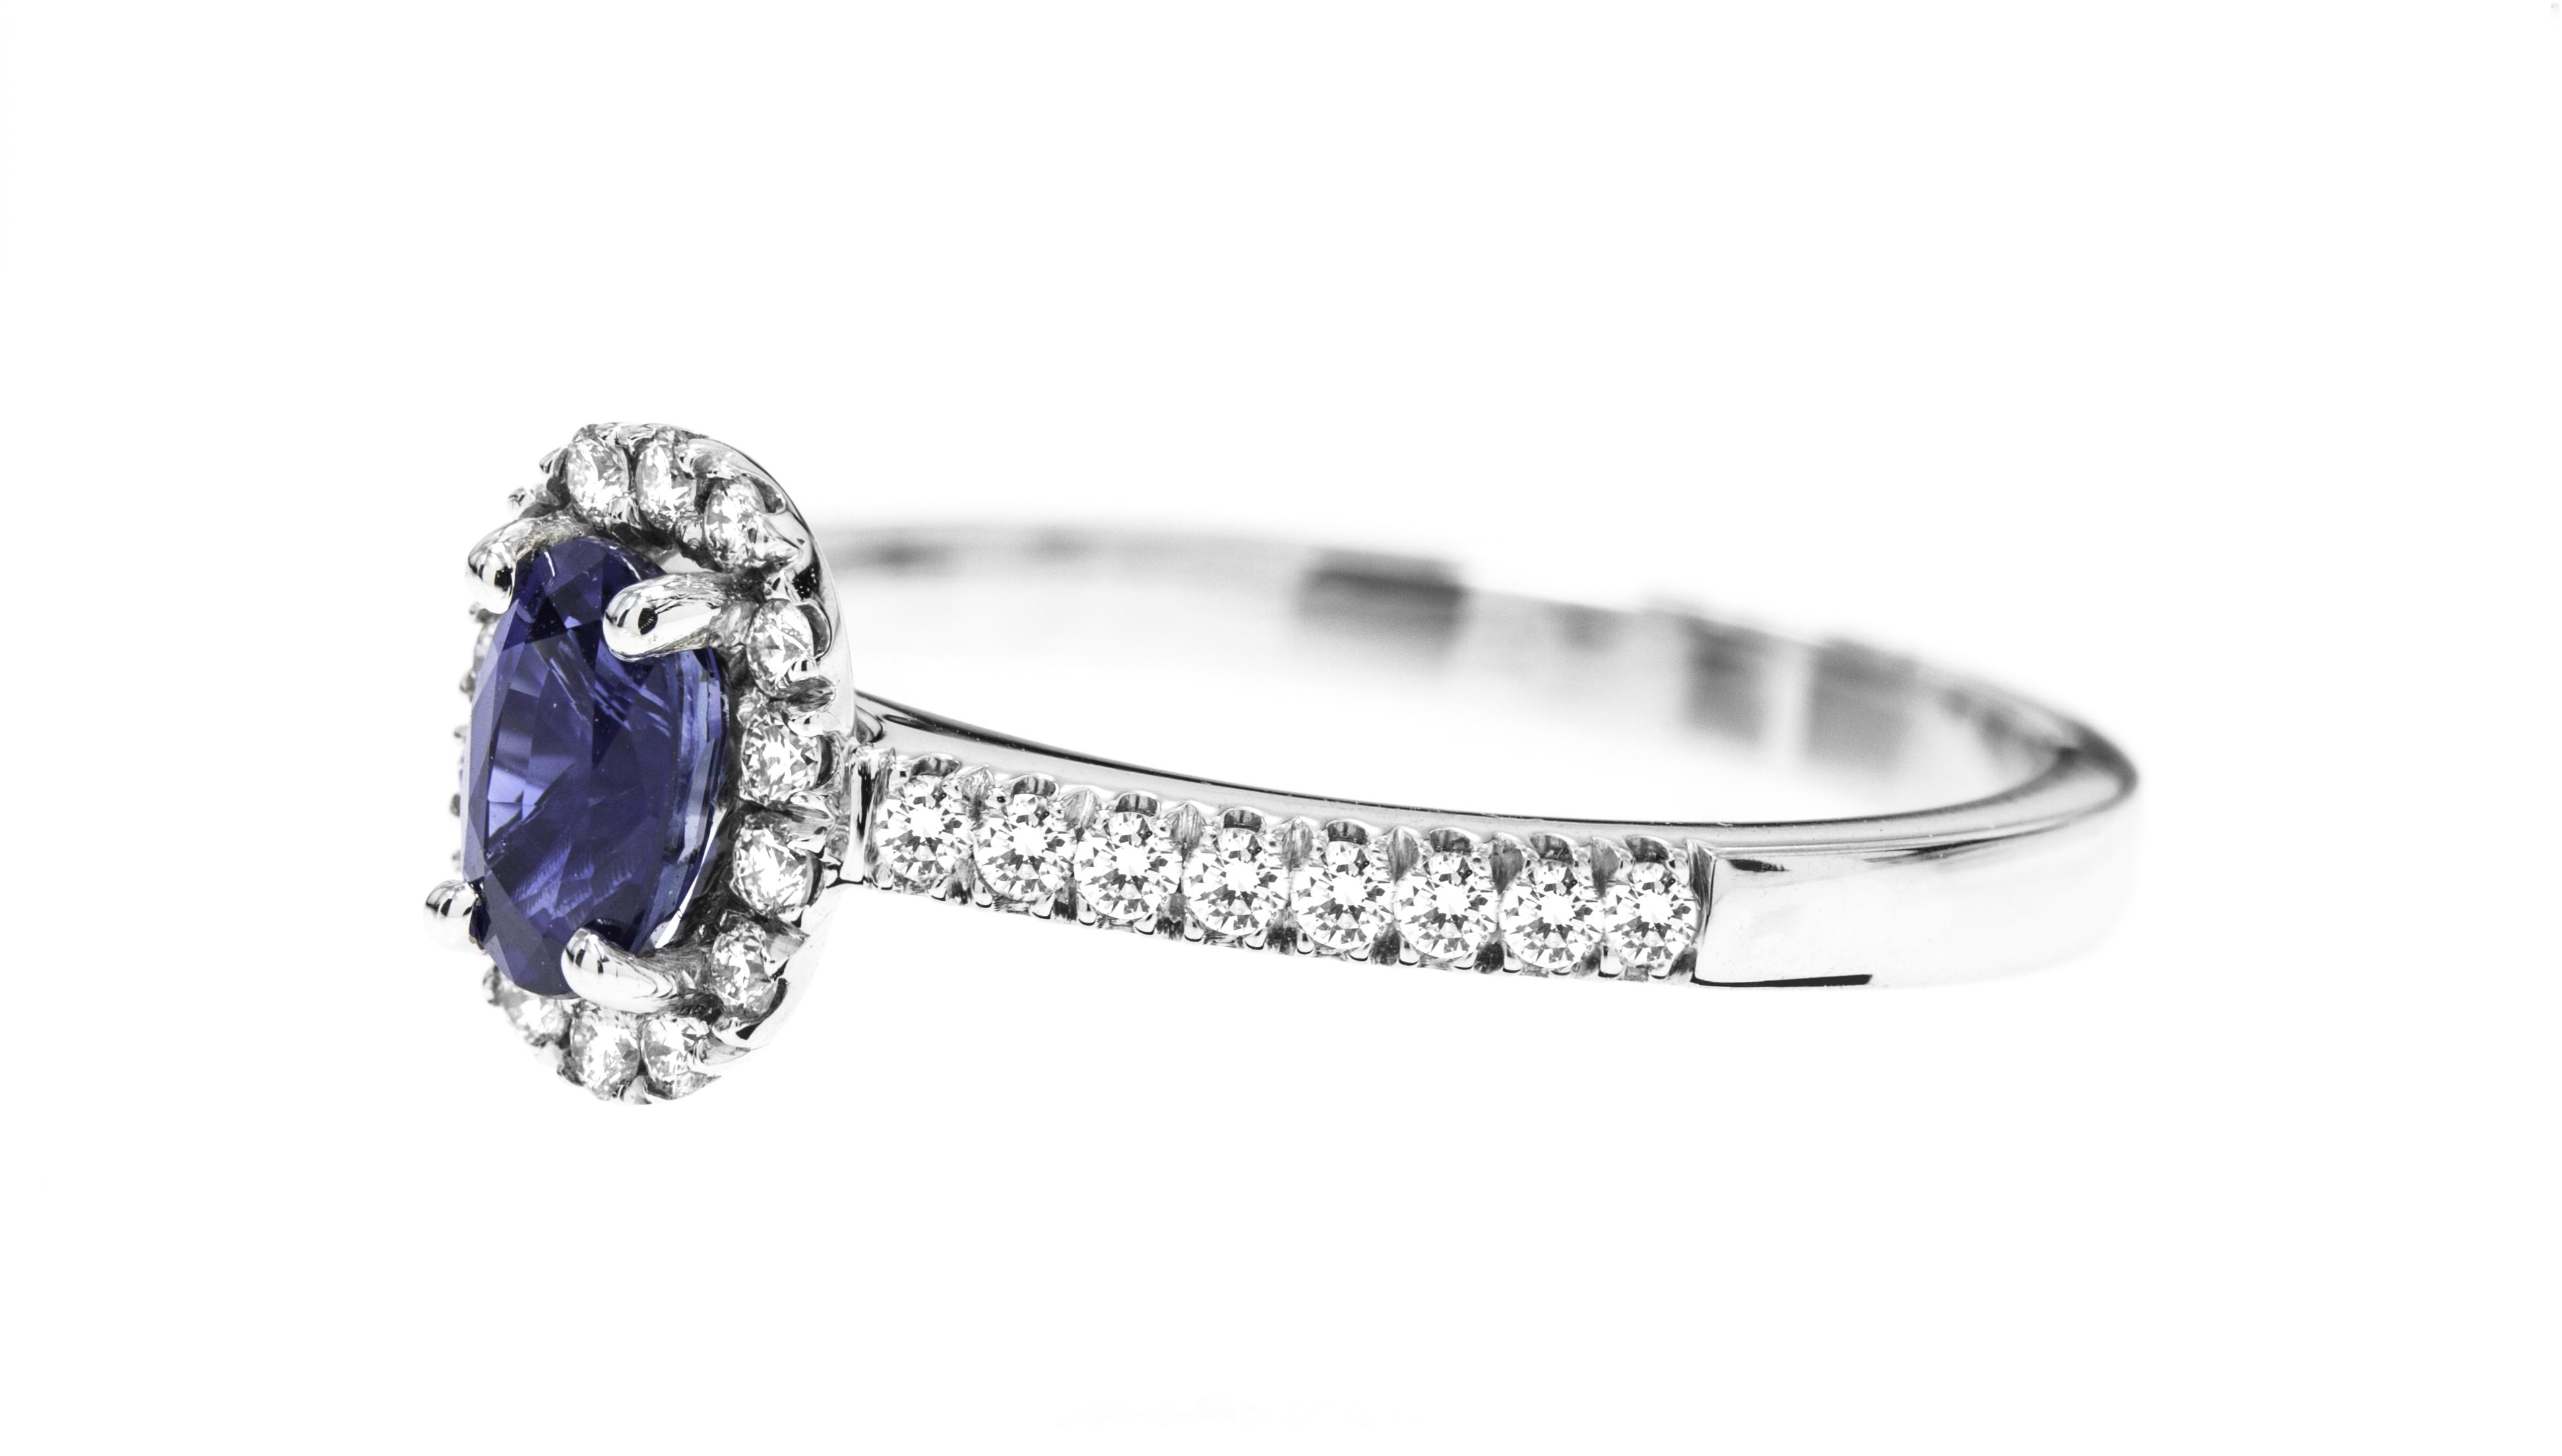 Inel Safir si Diamante Dama Aur Alb 18kt cu un Safir Oval si Diamante Rotunde-img1